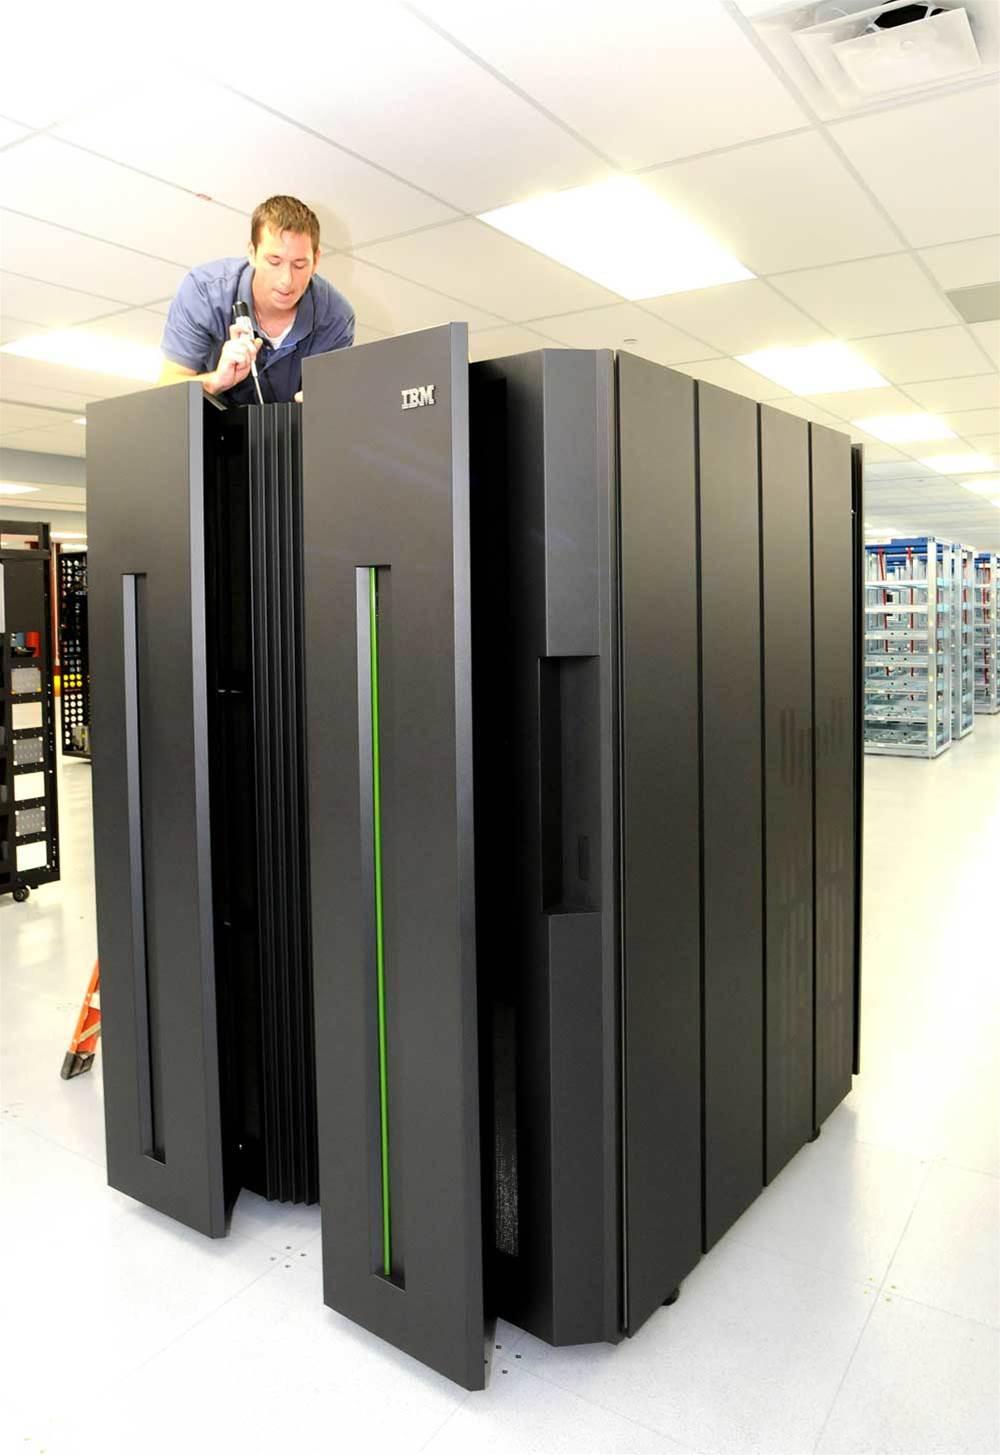 Ninemsn opts for public cloud